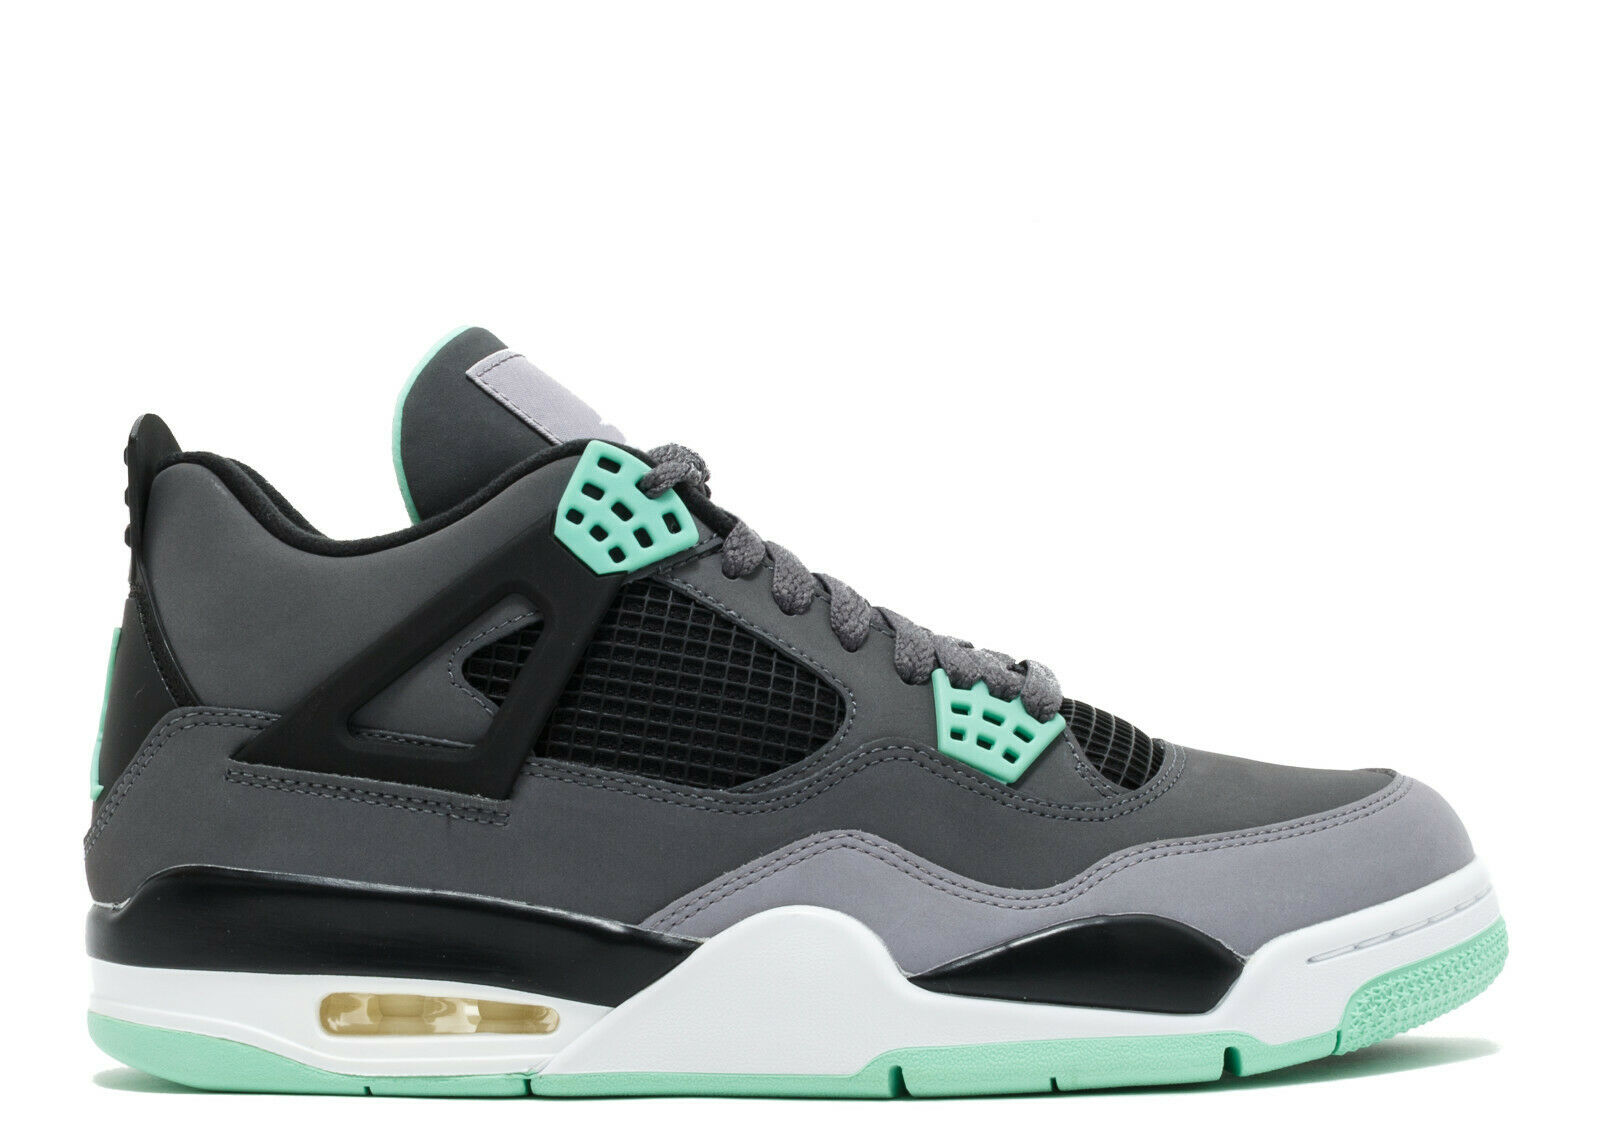 2013 Nike Air Jordan 4 IV Retro SZ 8.5 Green Glow OG Cement Grey 308497-033